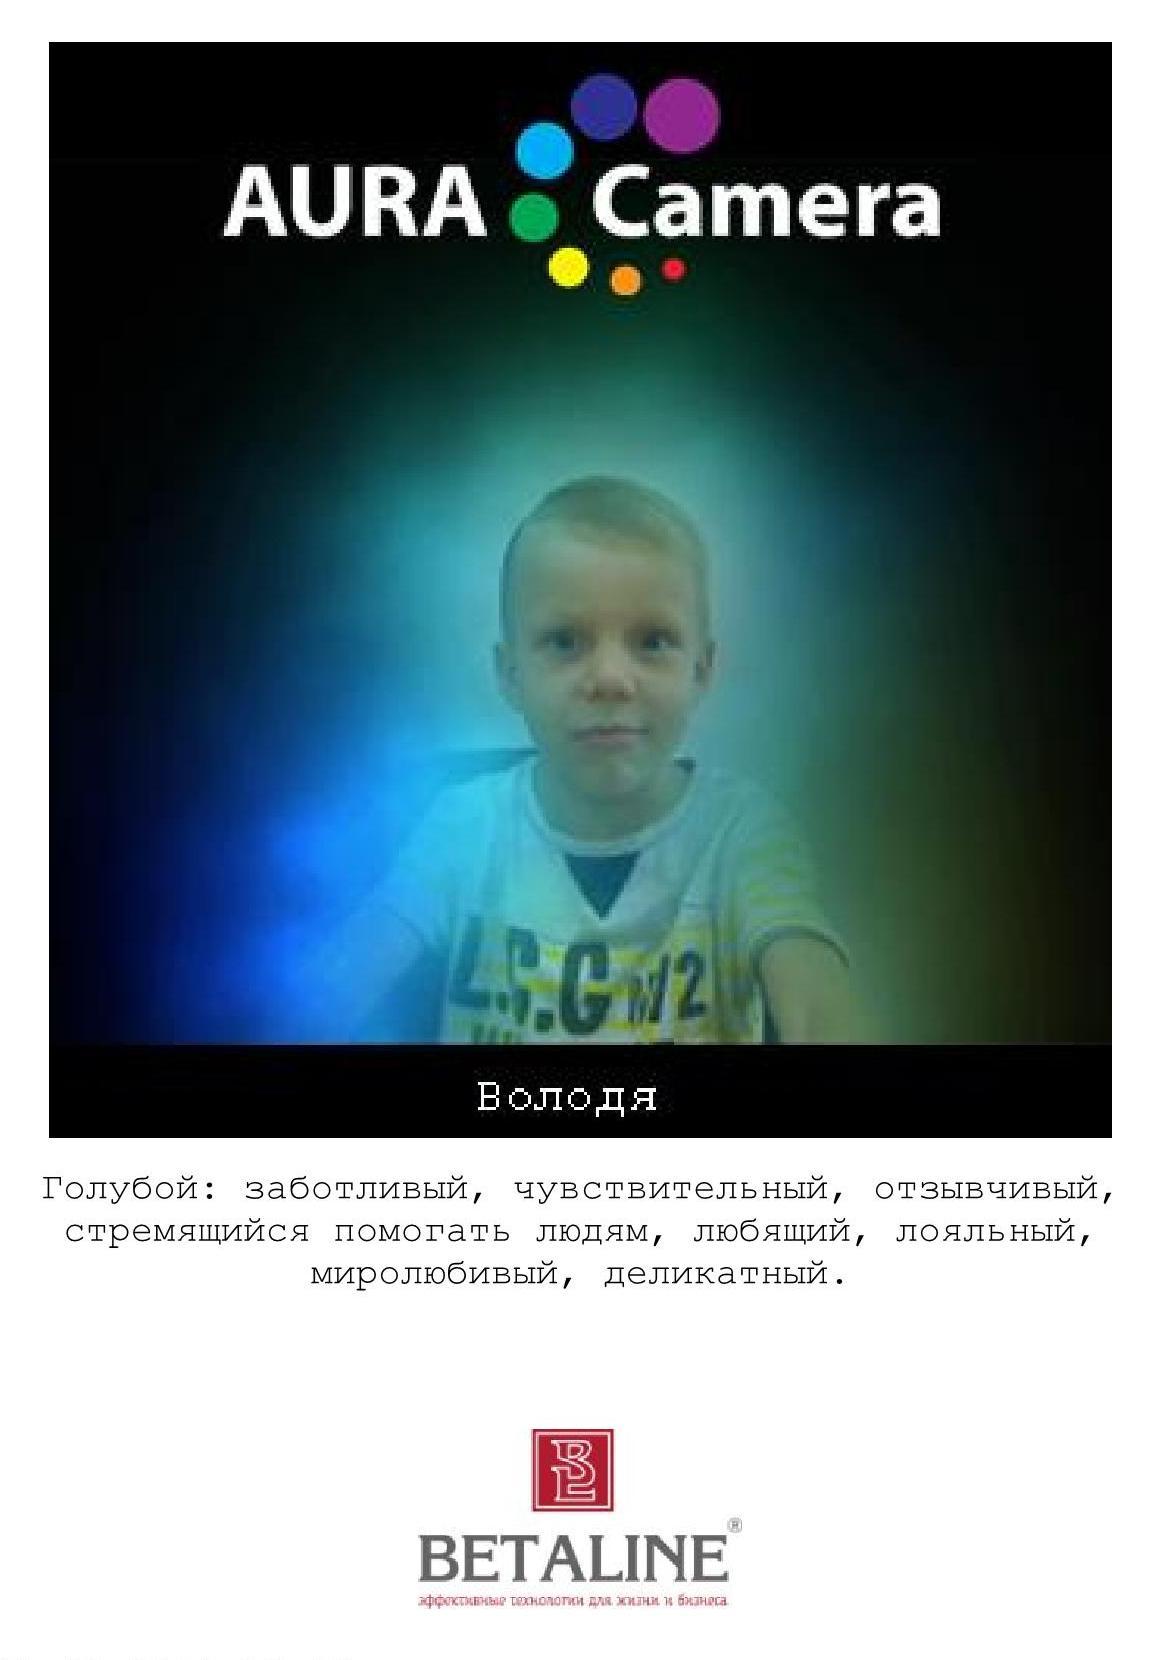 Report01N Стоцкий Володя1